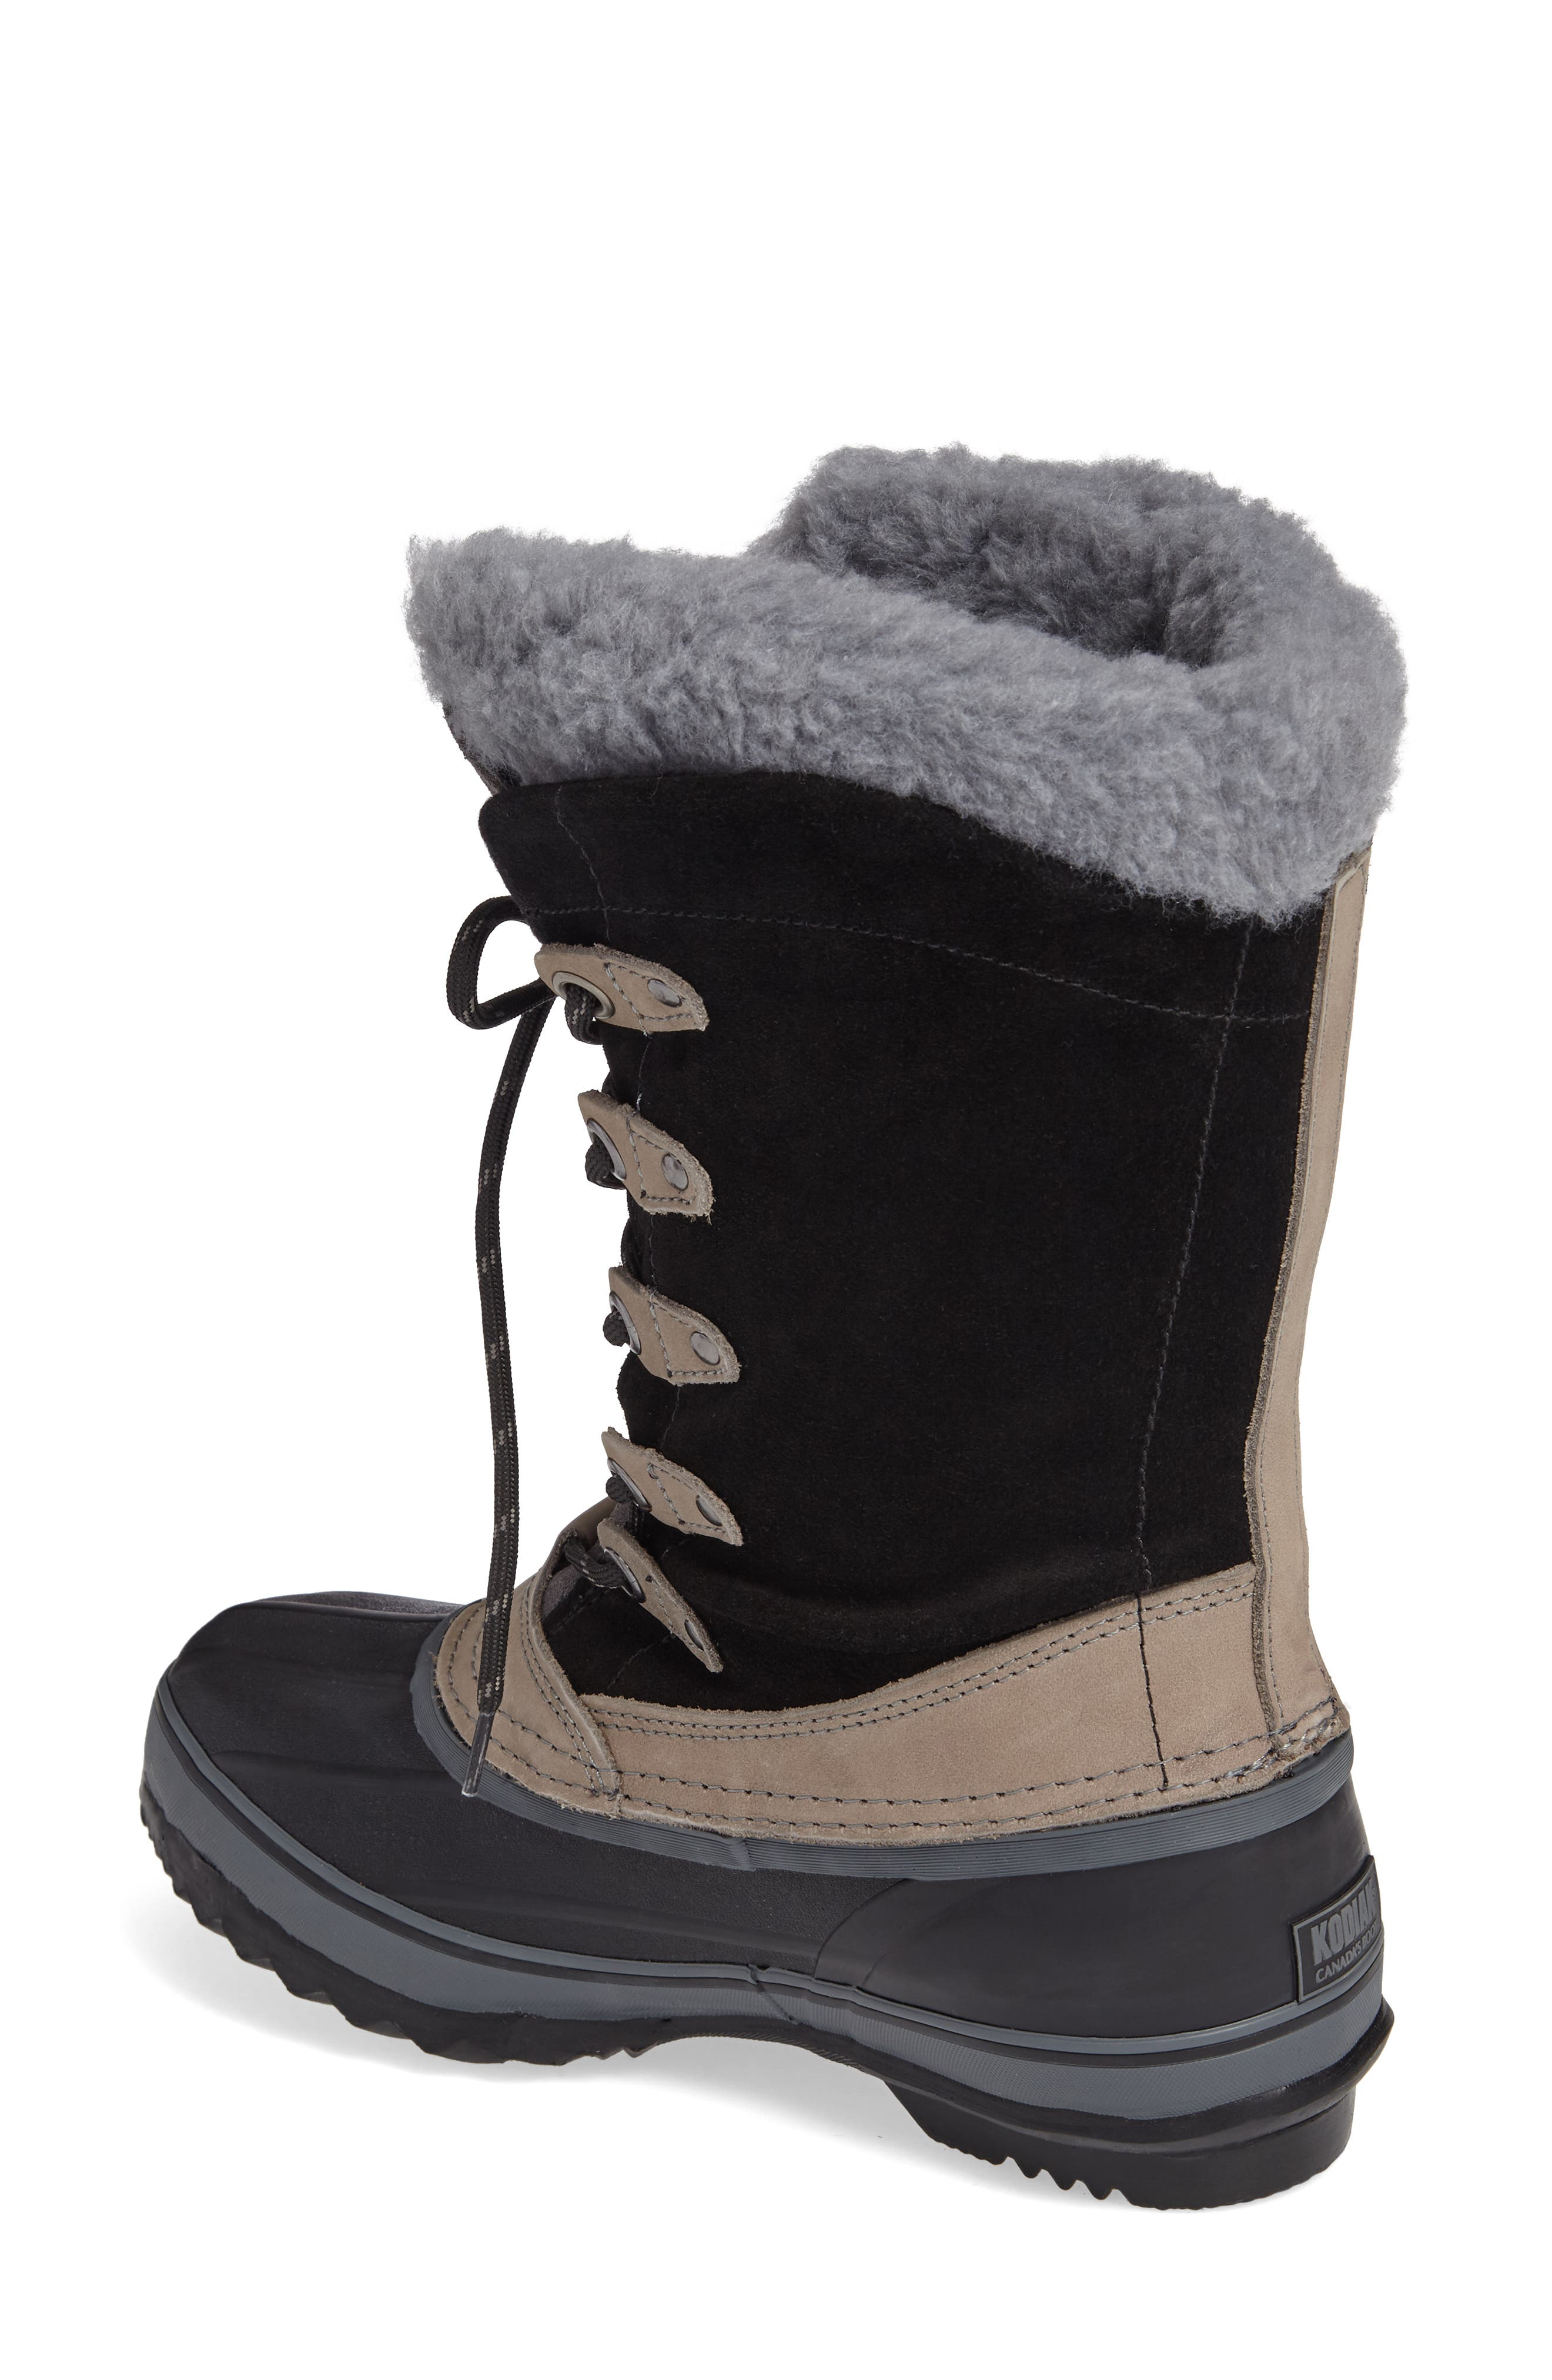 Kyra Waterproof Boot,                             Alternate thumbnail 2, color,                             001